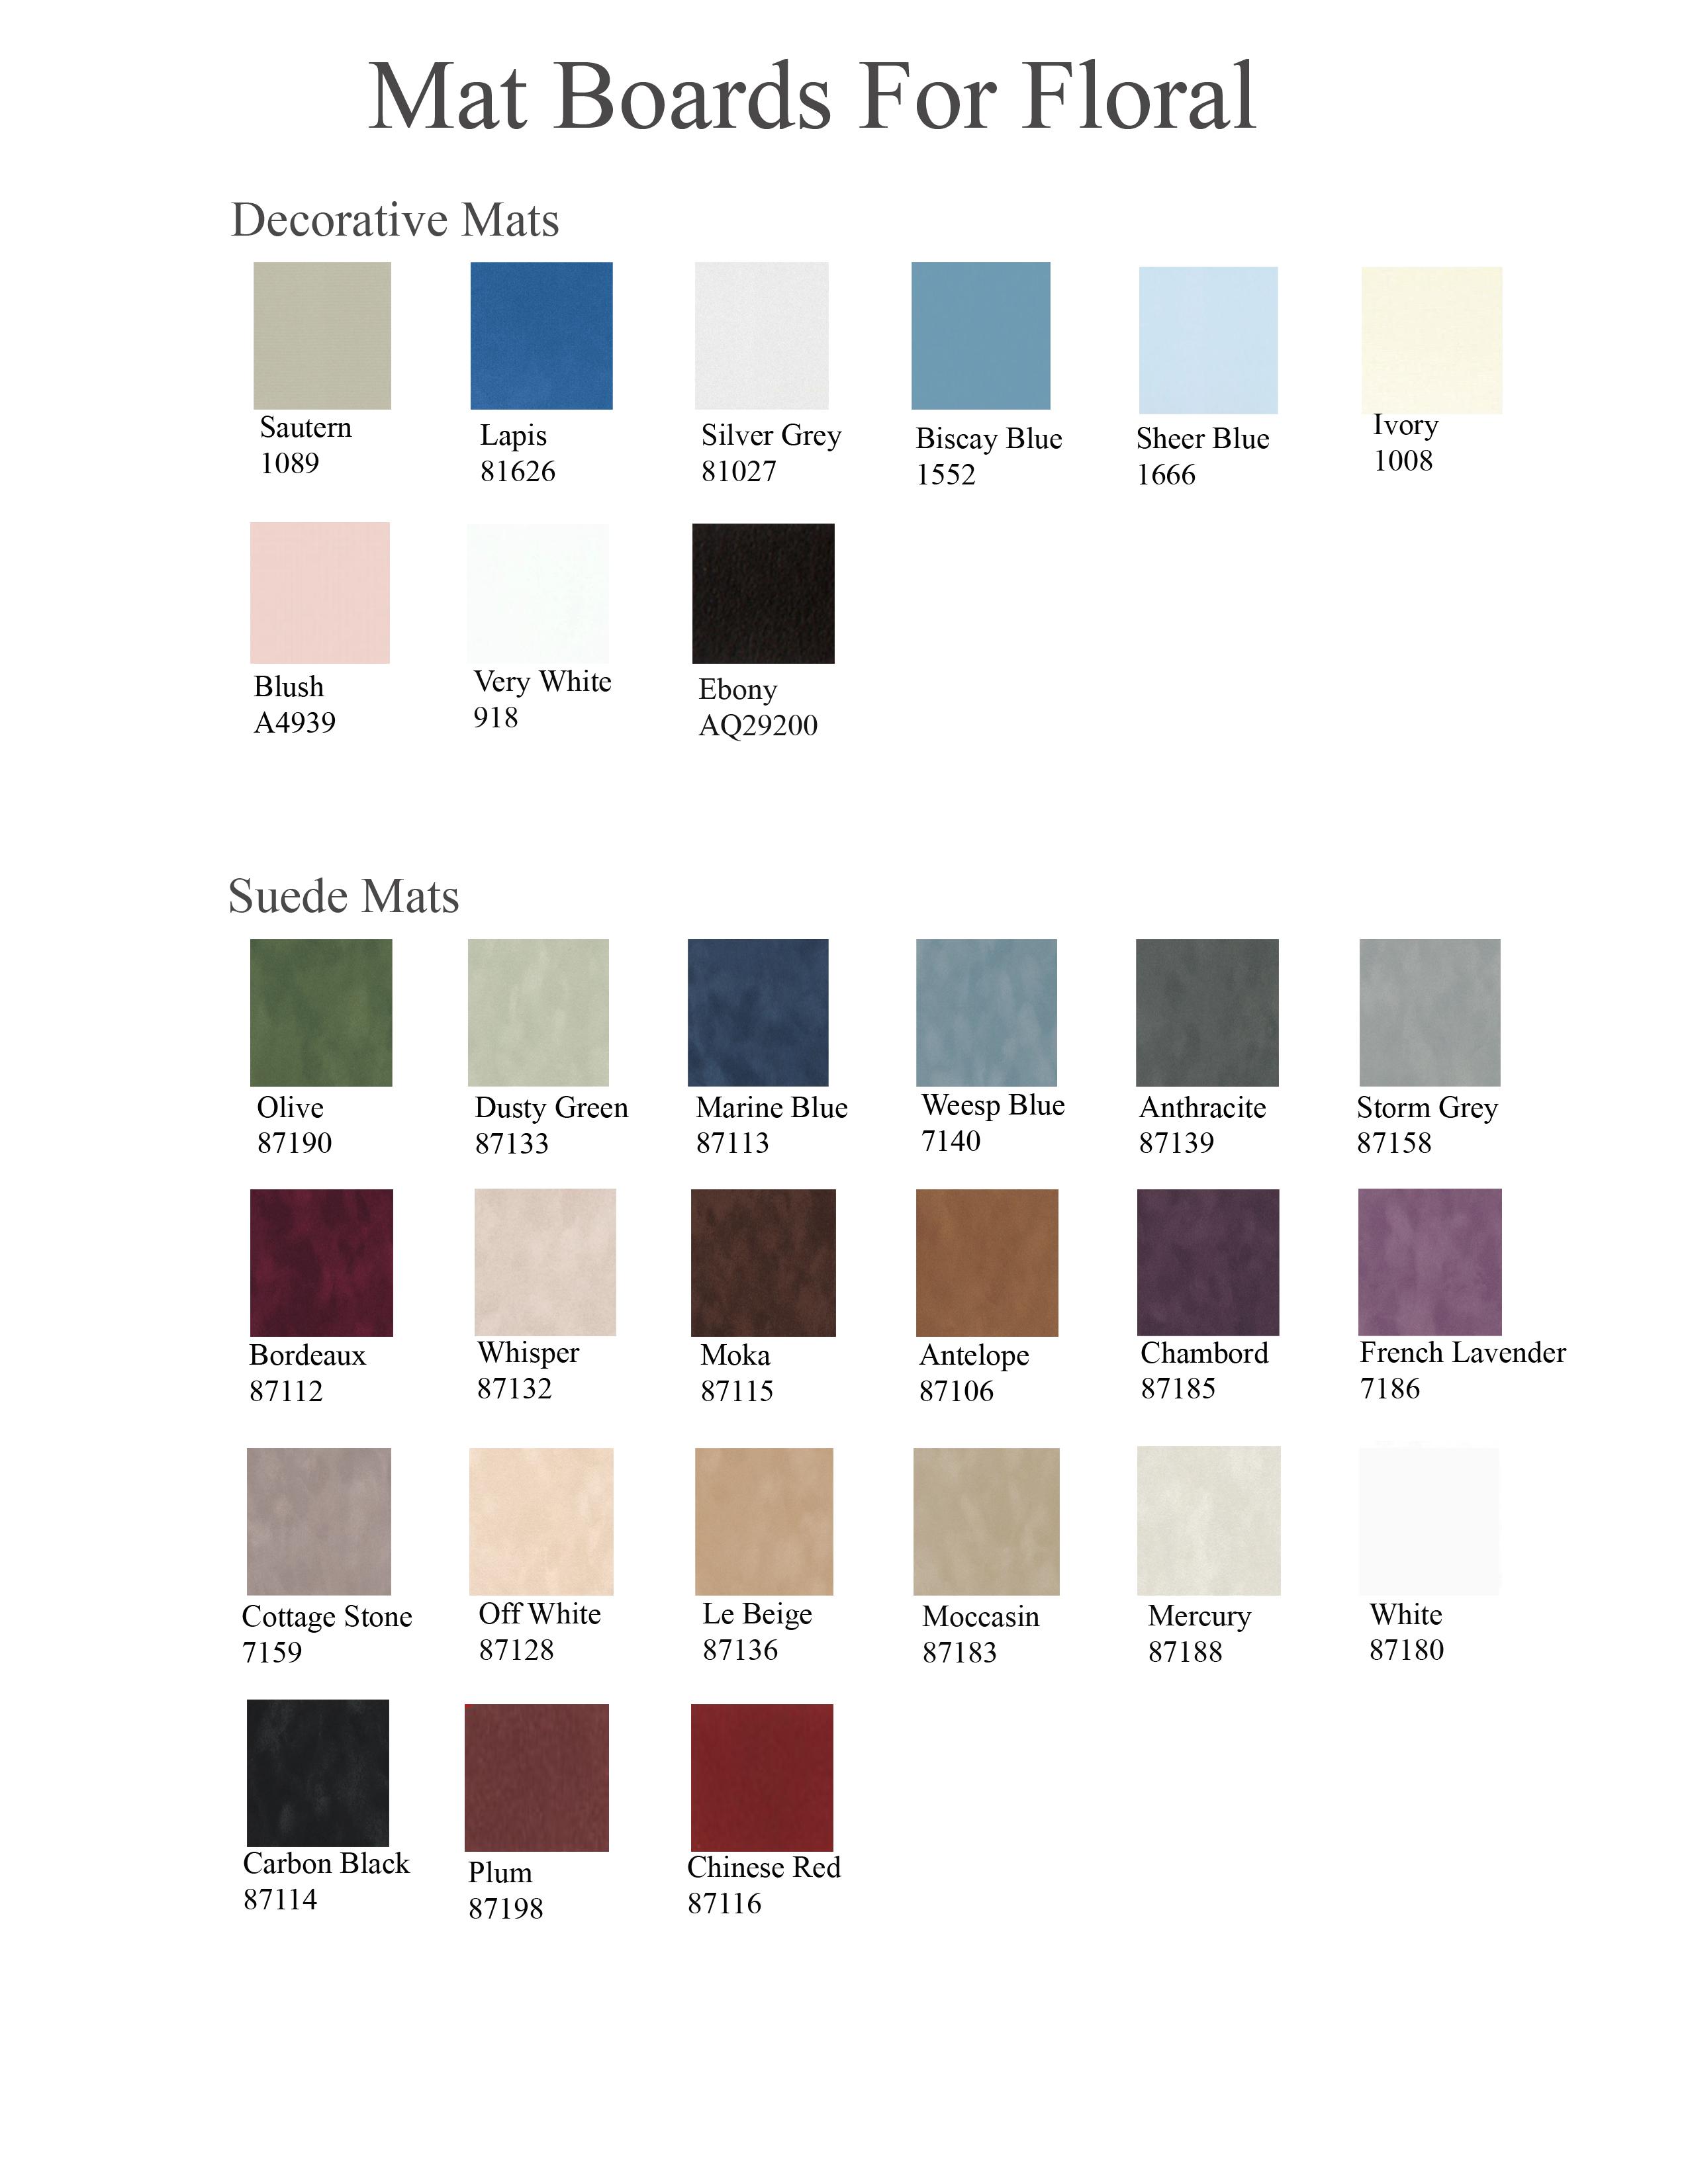 mats-colour-specsjuly-2021.jpg